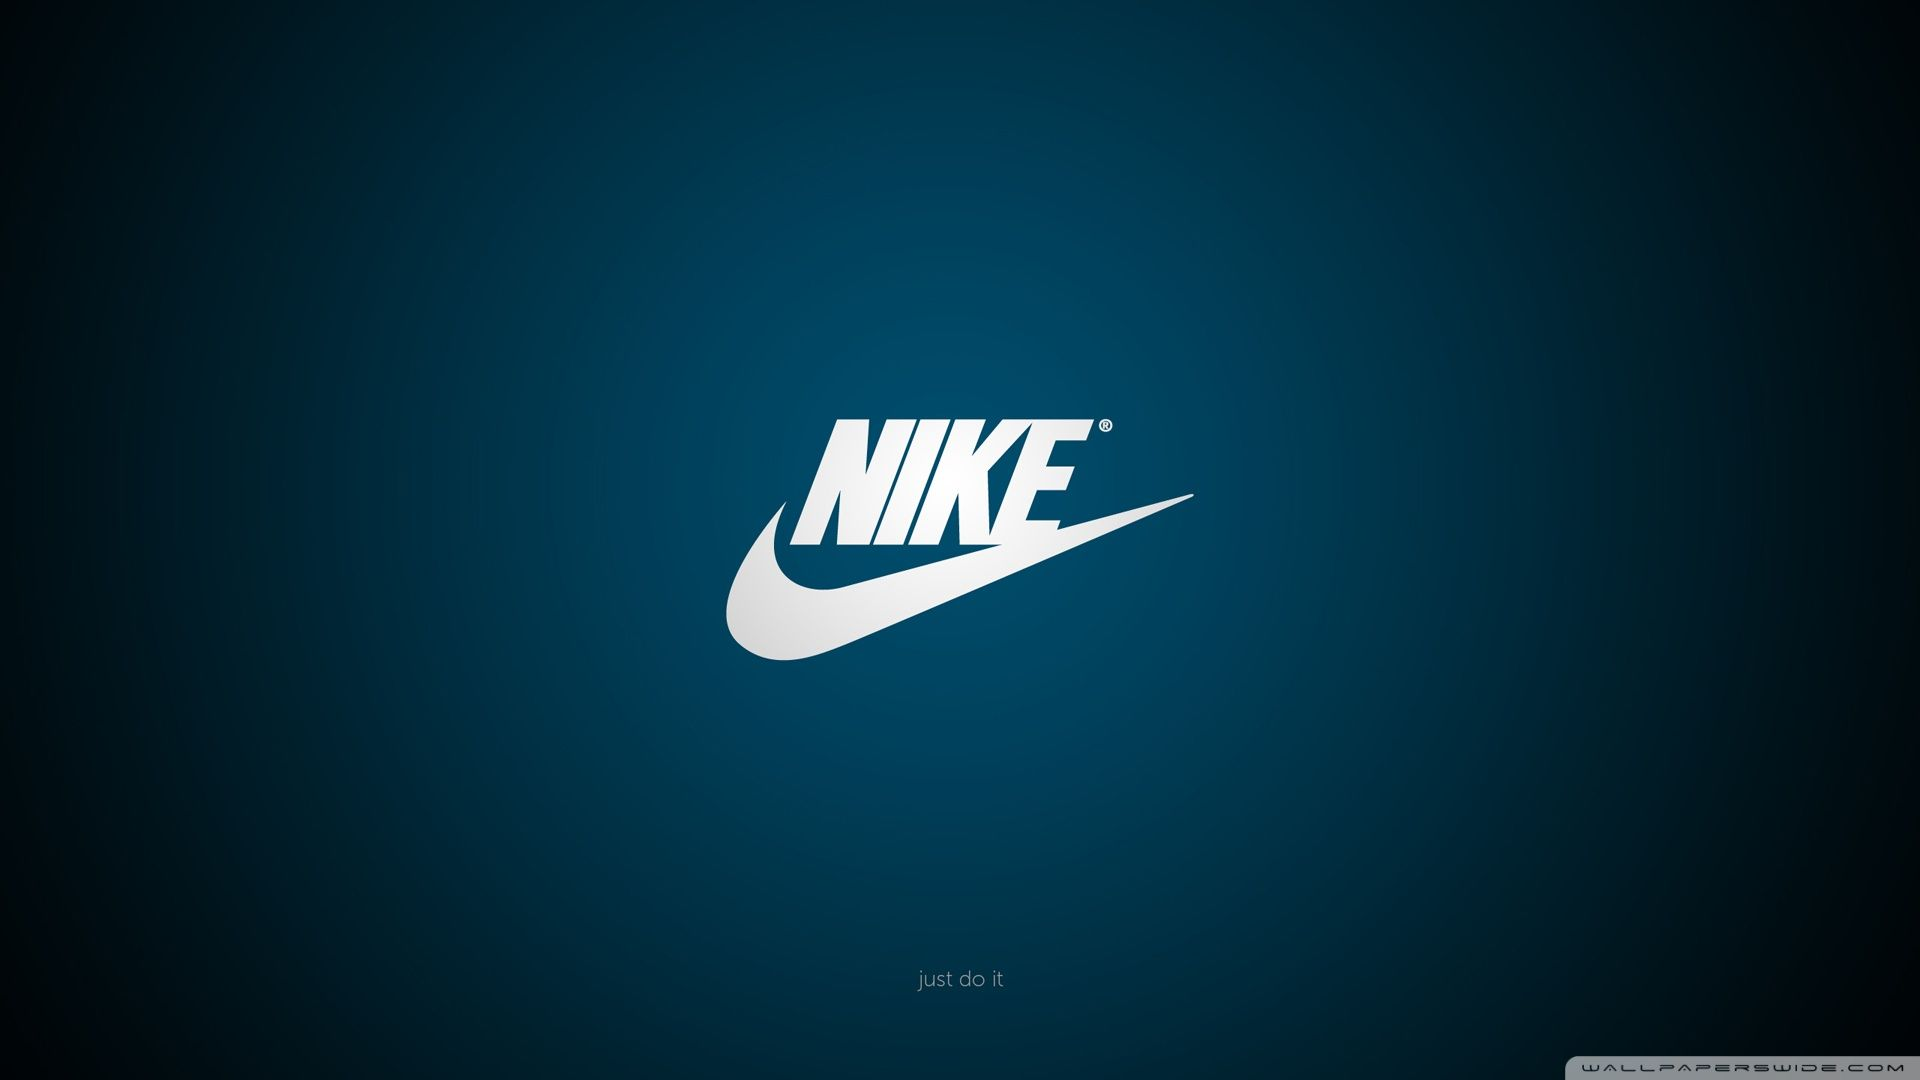 Nike just do it logo iphone wallpaper download roblox - 3d Nike Wallpaper 6 2leephd